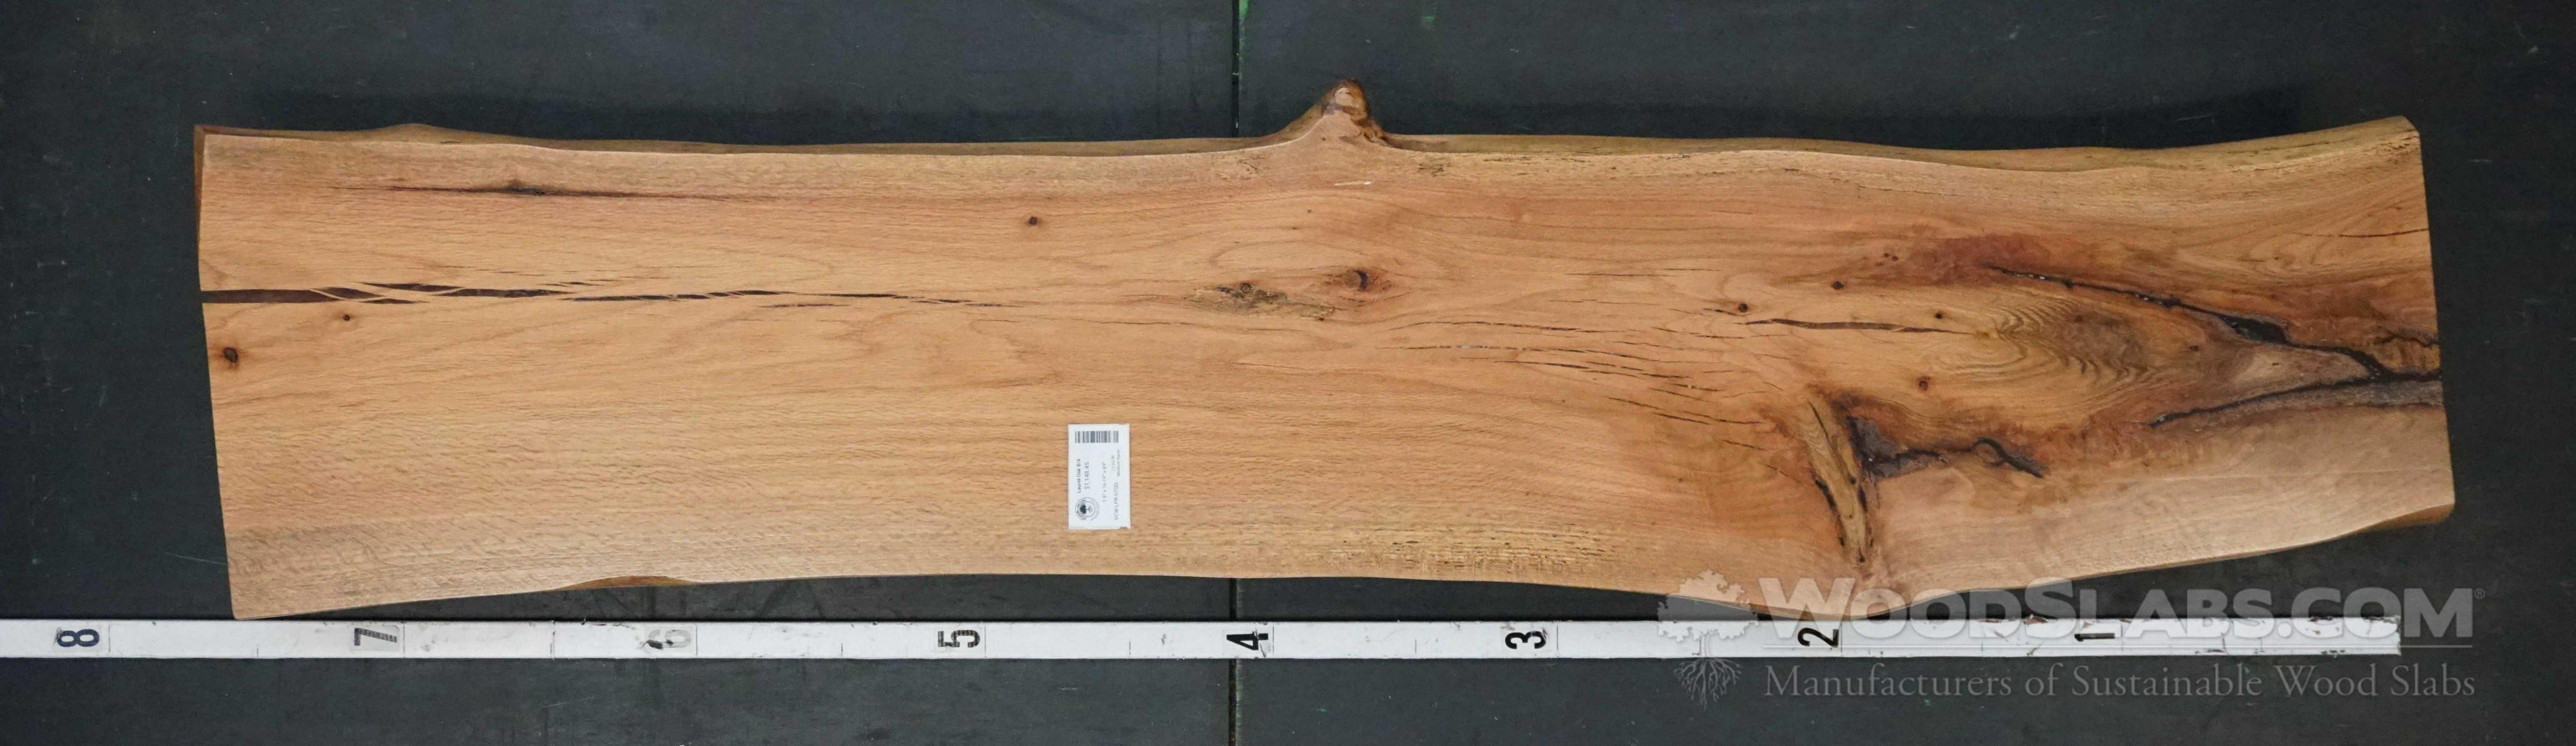 hardwood floor refinishing buffalo ny of woodslabs com laurel oak pertaining to laurel oak wood slab vcw lpr 07qd